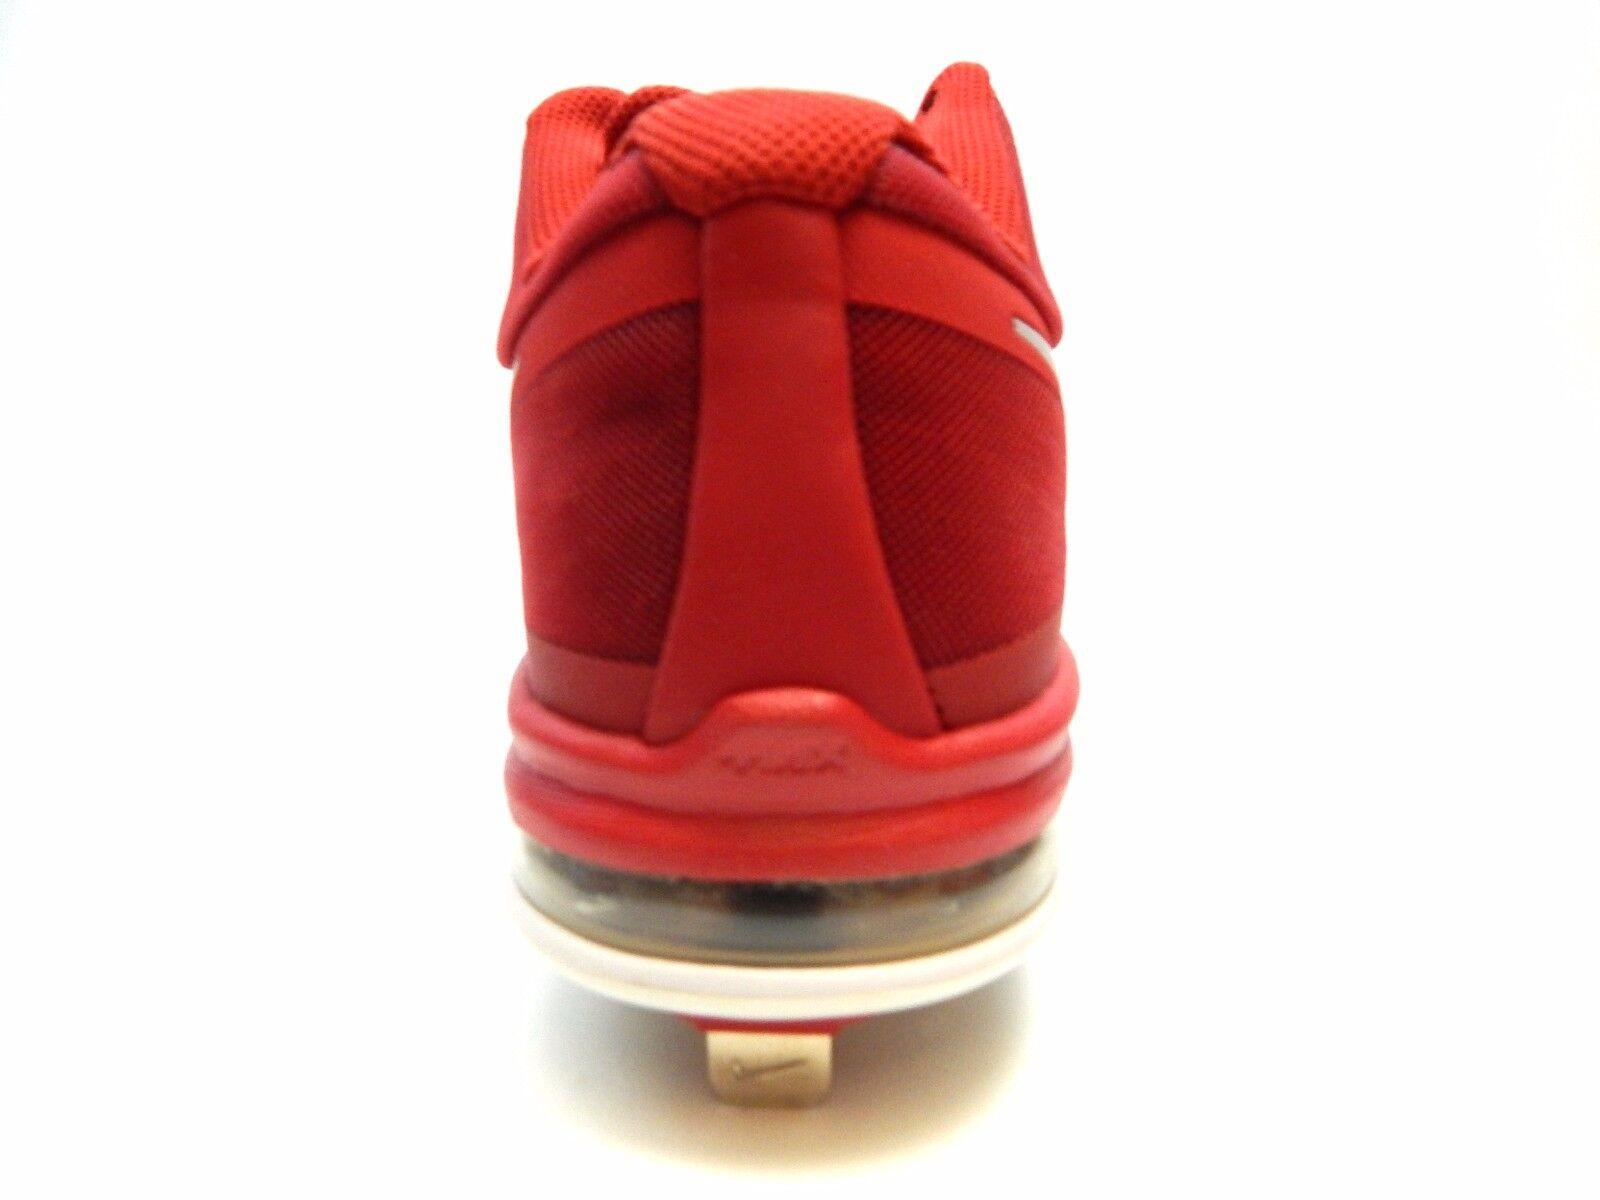 nike air max mvp elite 3 / 4 chaussures chaussures chaussures de baseball 524957 610 taille 12 & 12,5   De Qualité Supérieure  f585dd